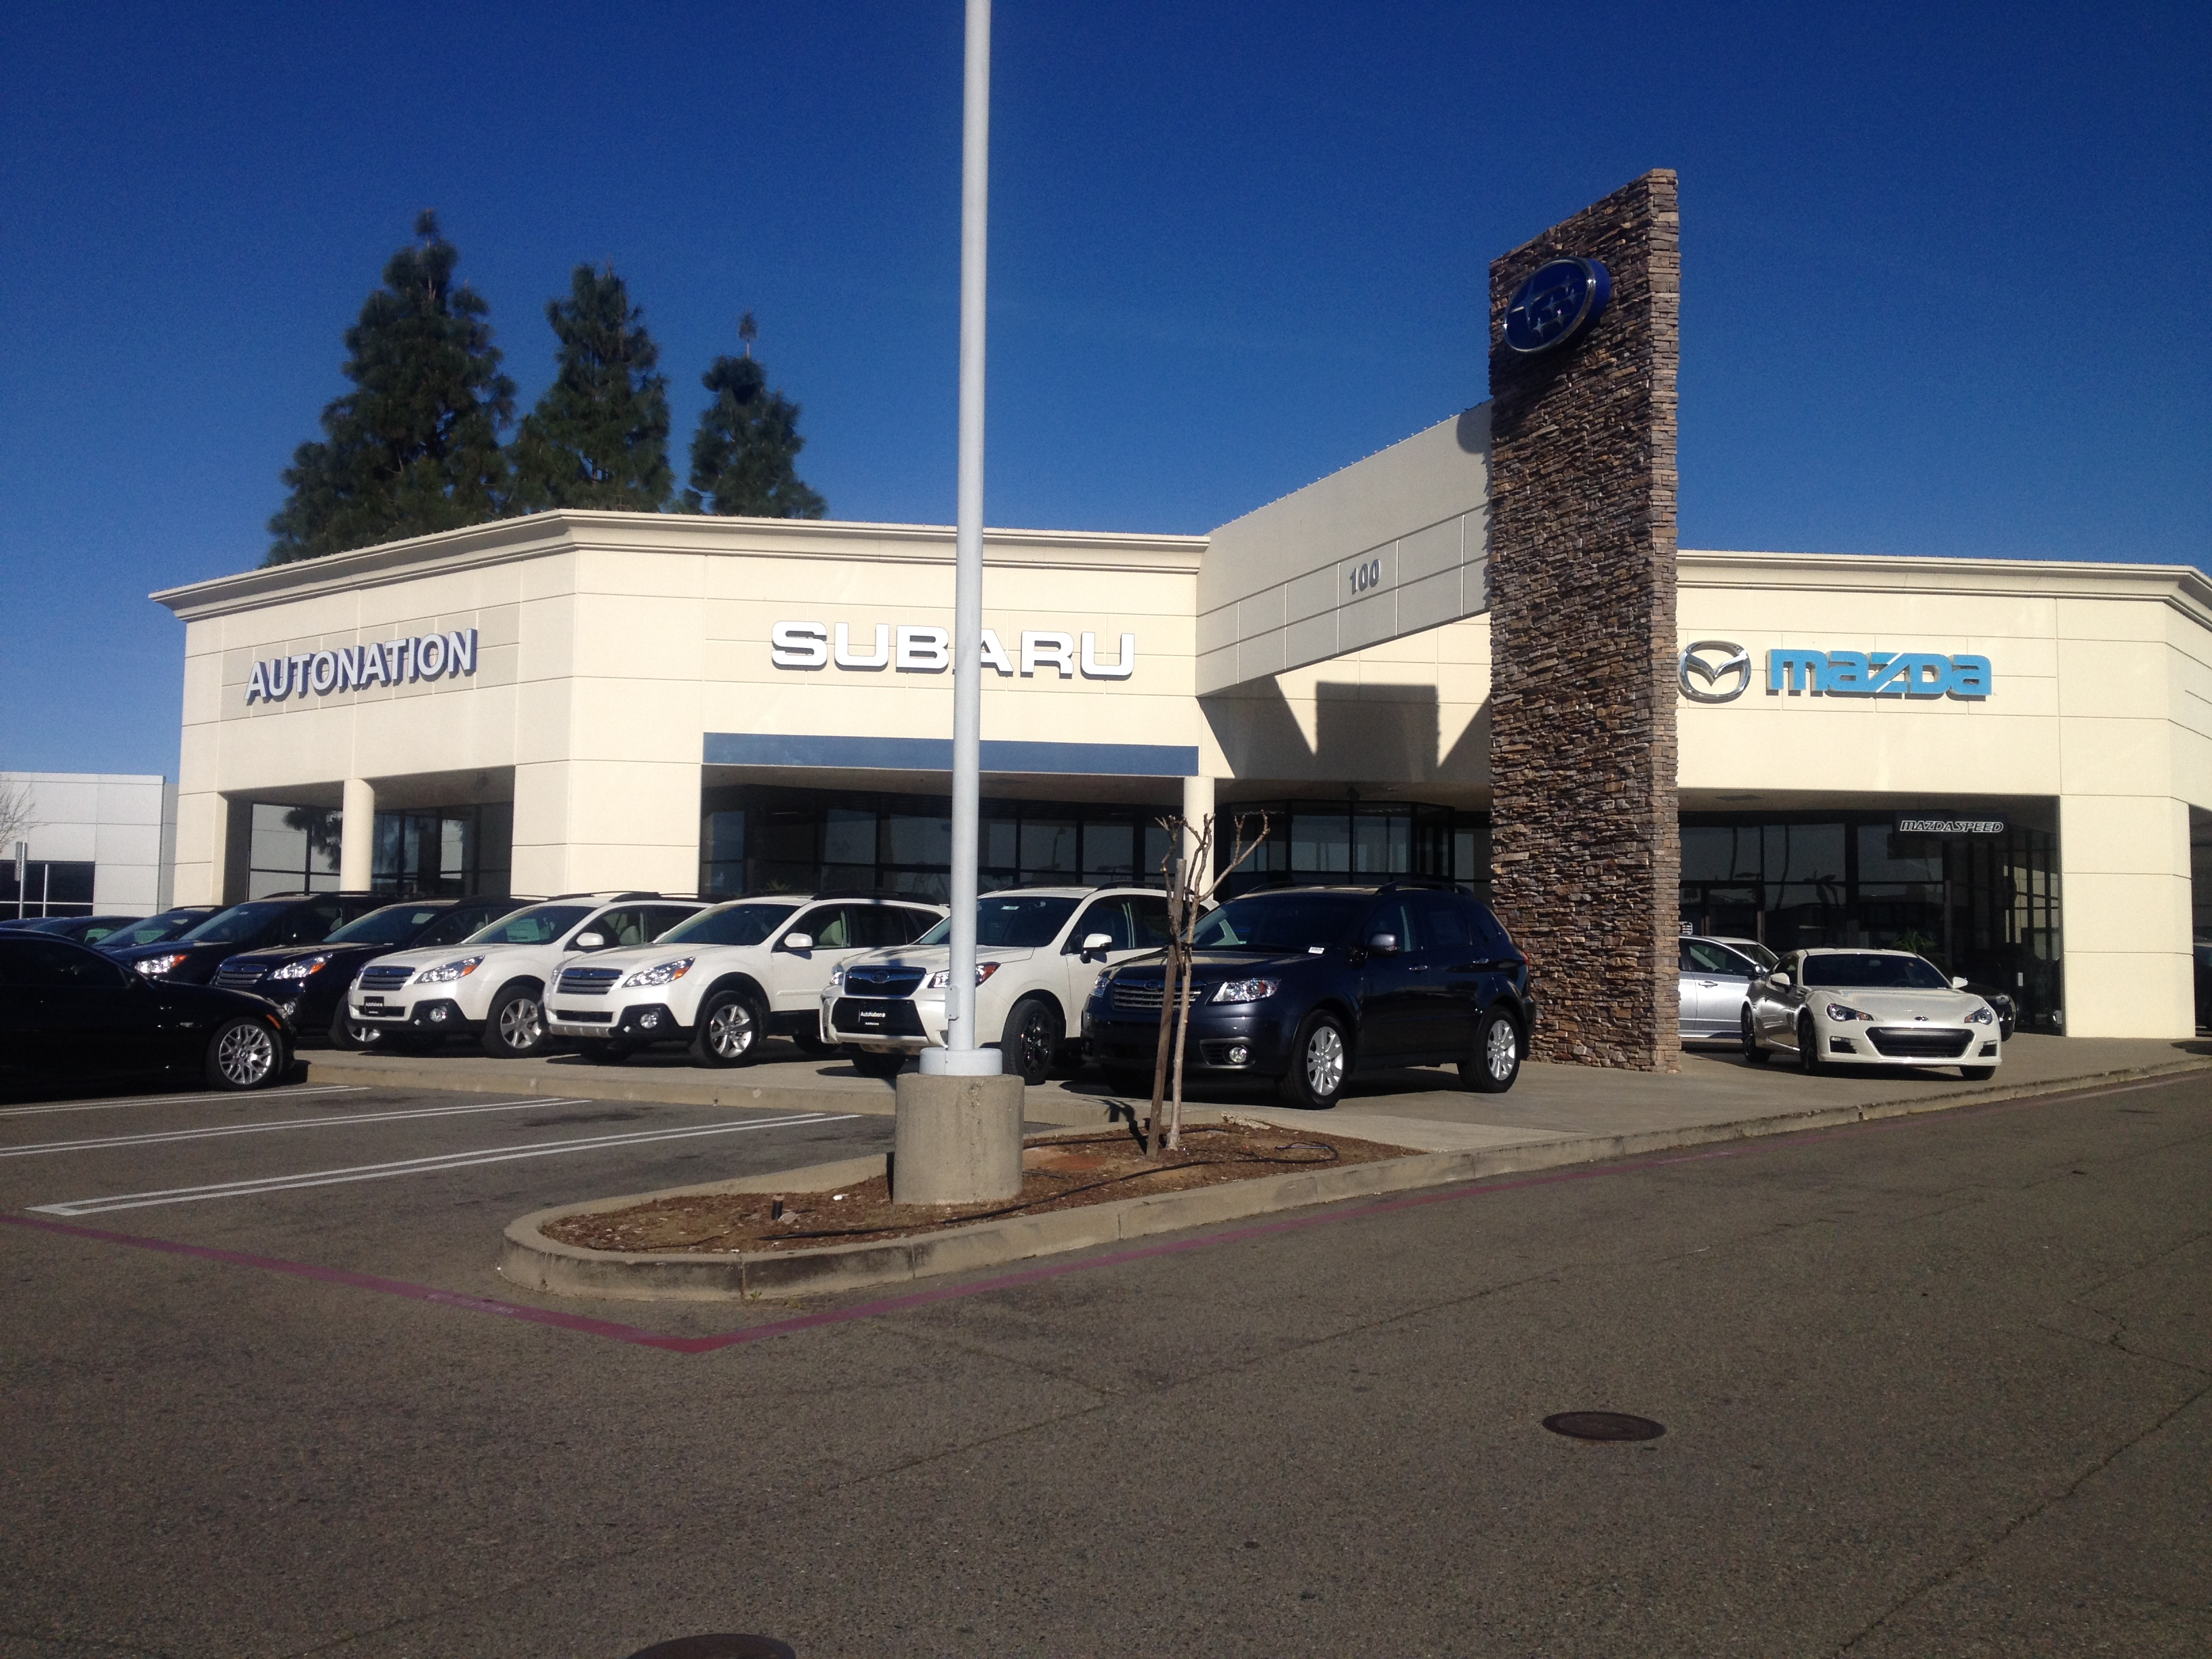 AutoNation Subaru Roseville image 0